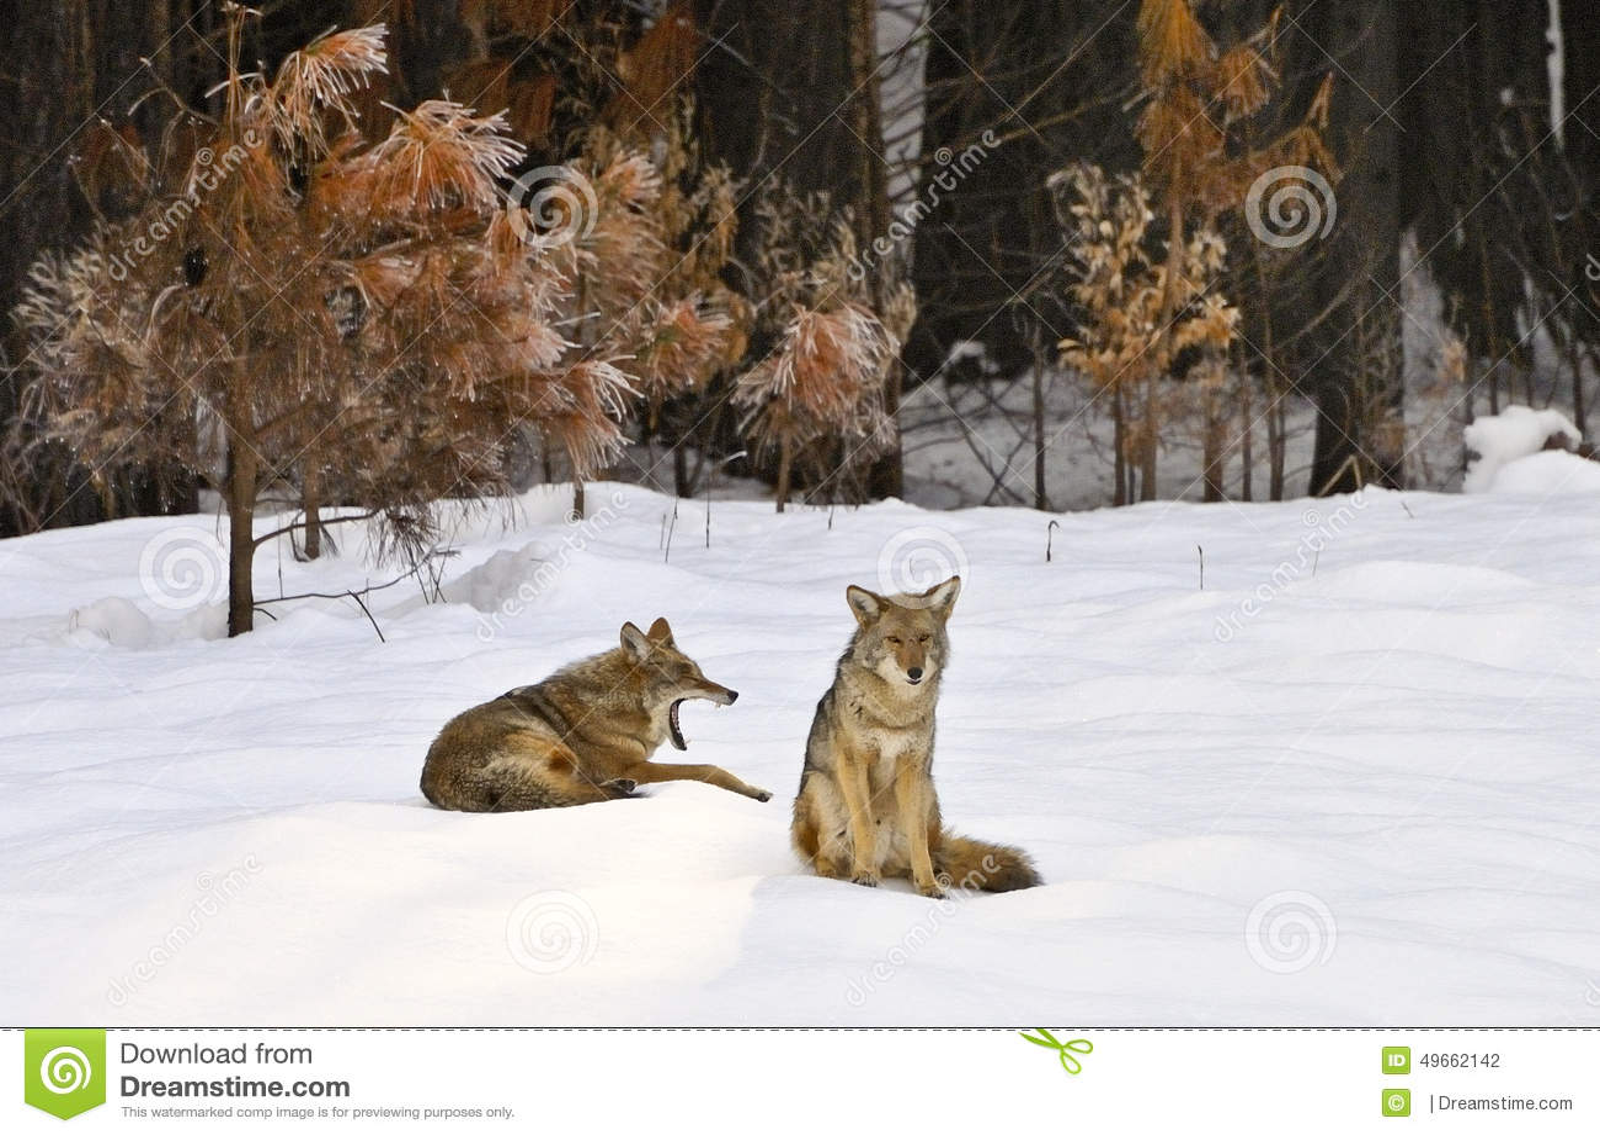 Stillstehende wilde Kojoten im Schnee, Yosemite-Tal, Yosemite Nationalpark